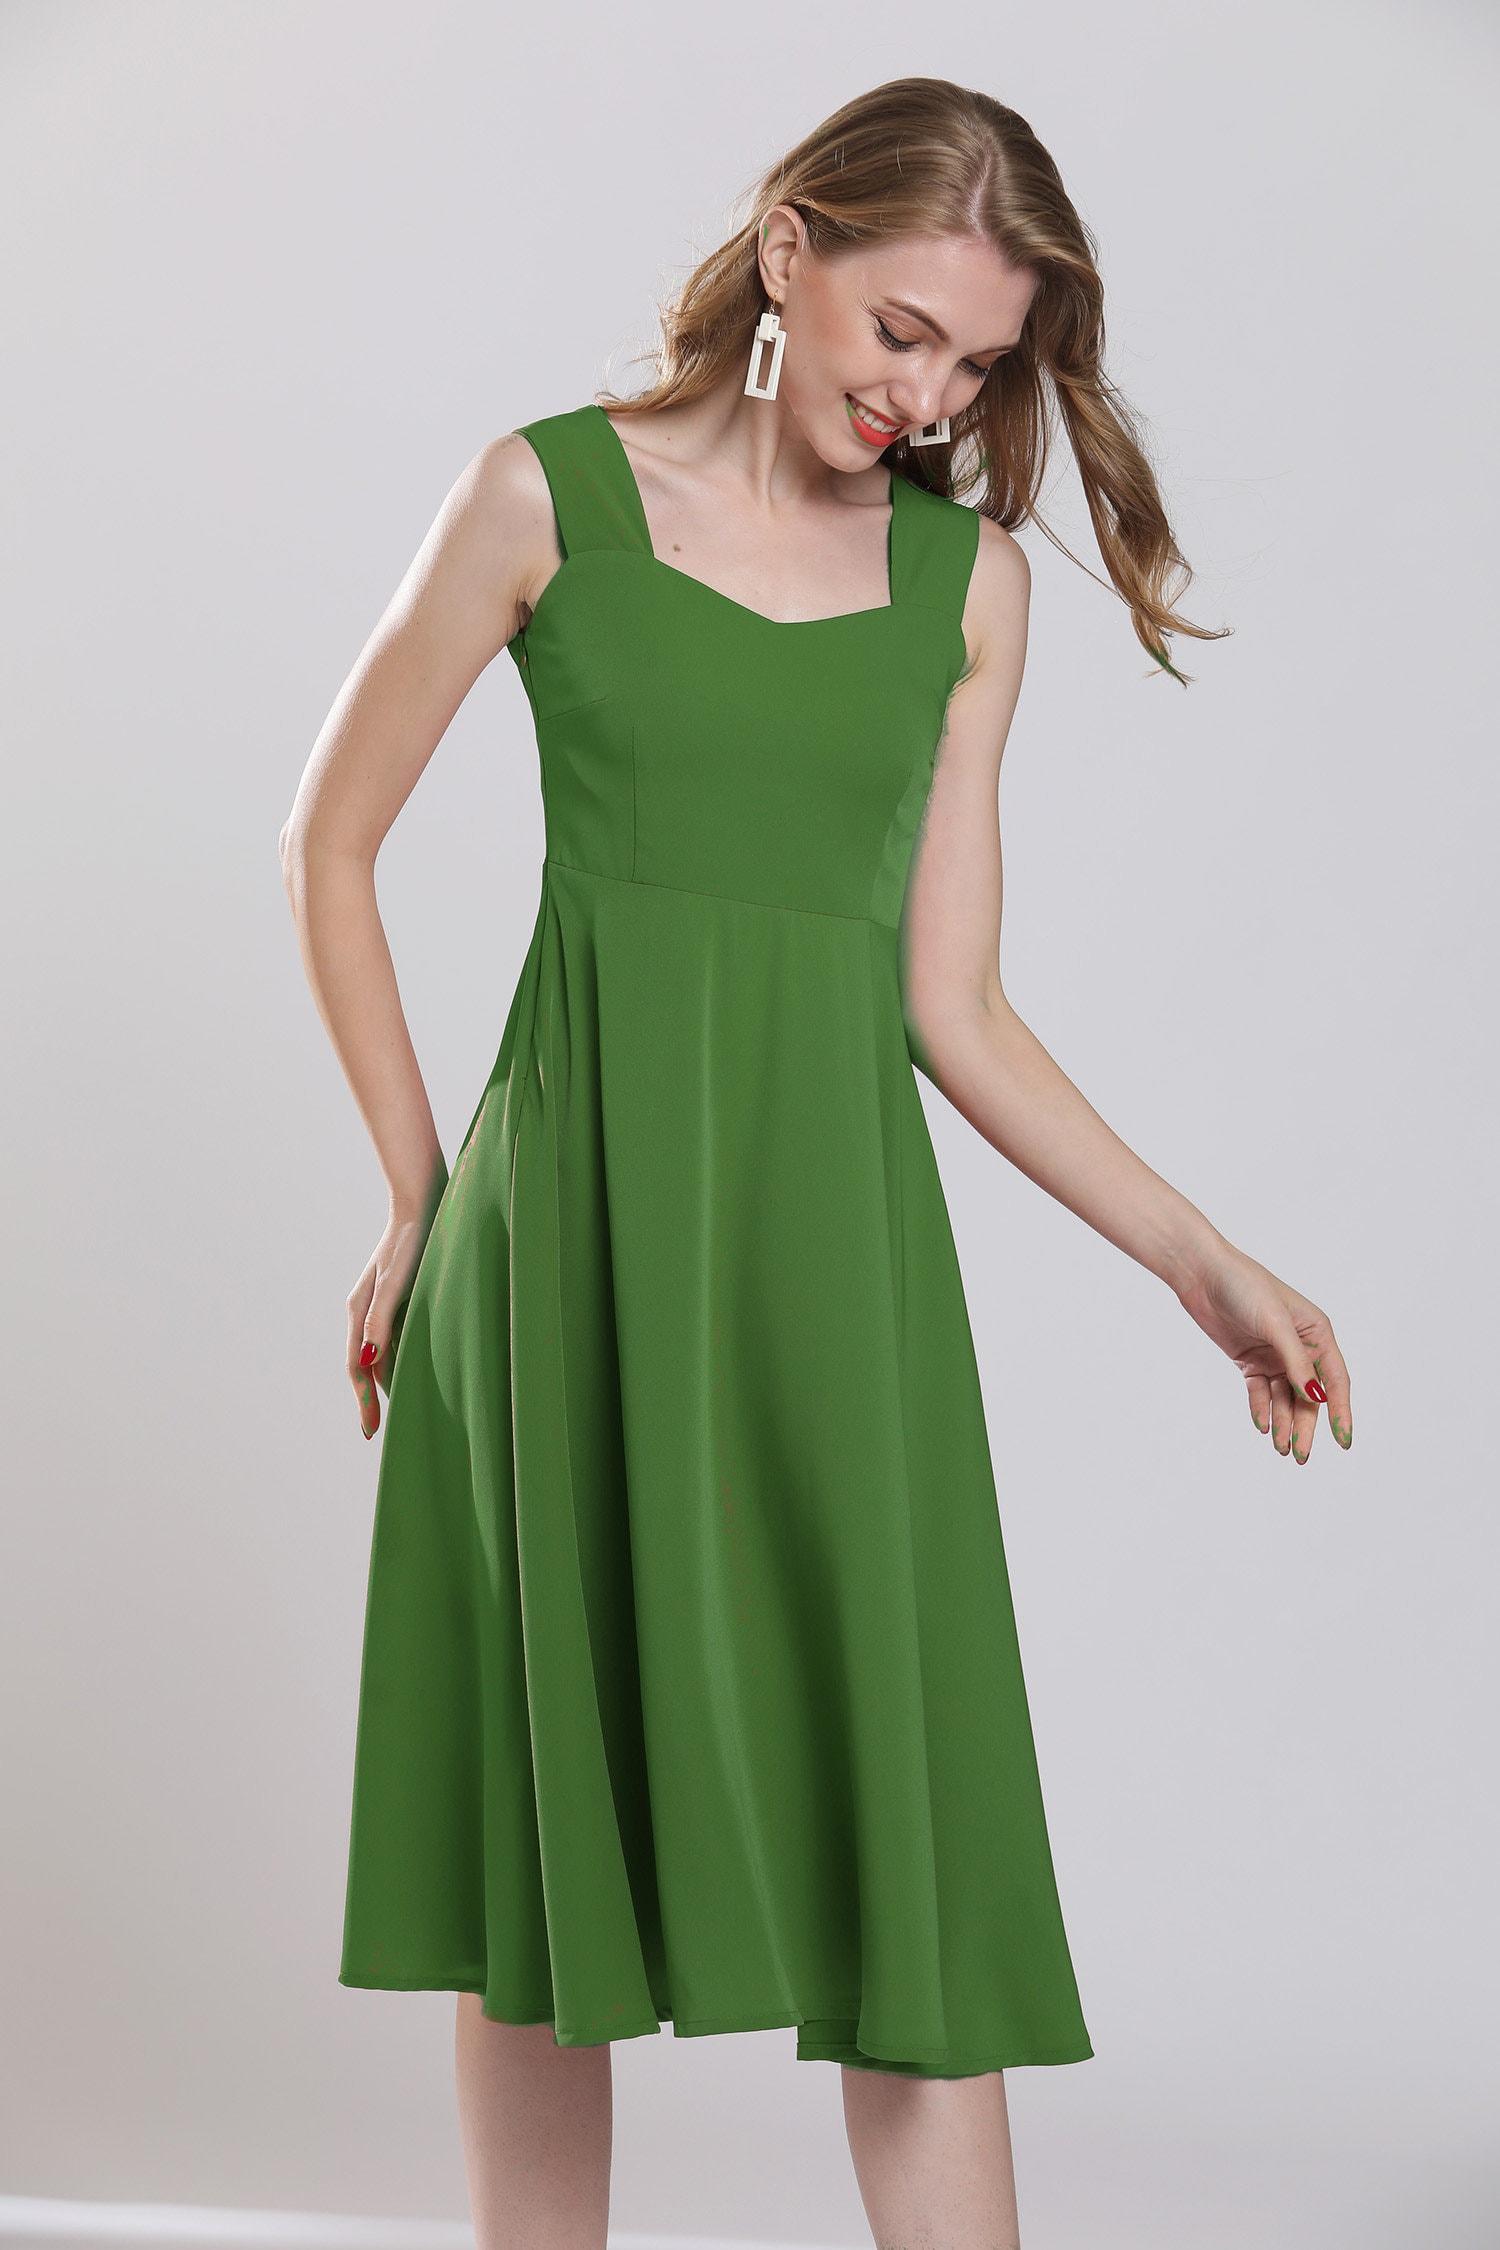 Jade green maxi dress plus size tunic chiffon dress beach sundress ankle  length tea dress evening dresses prom dress wedding dress